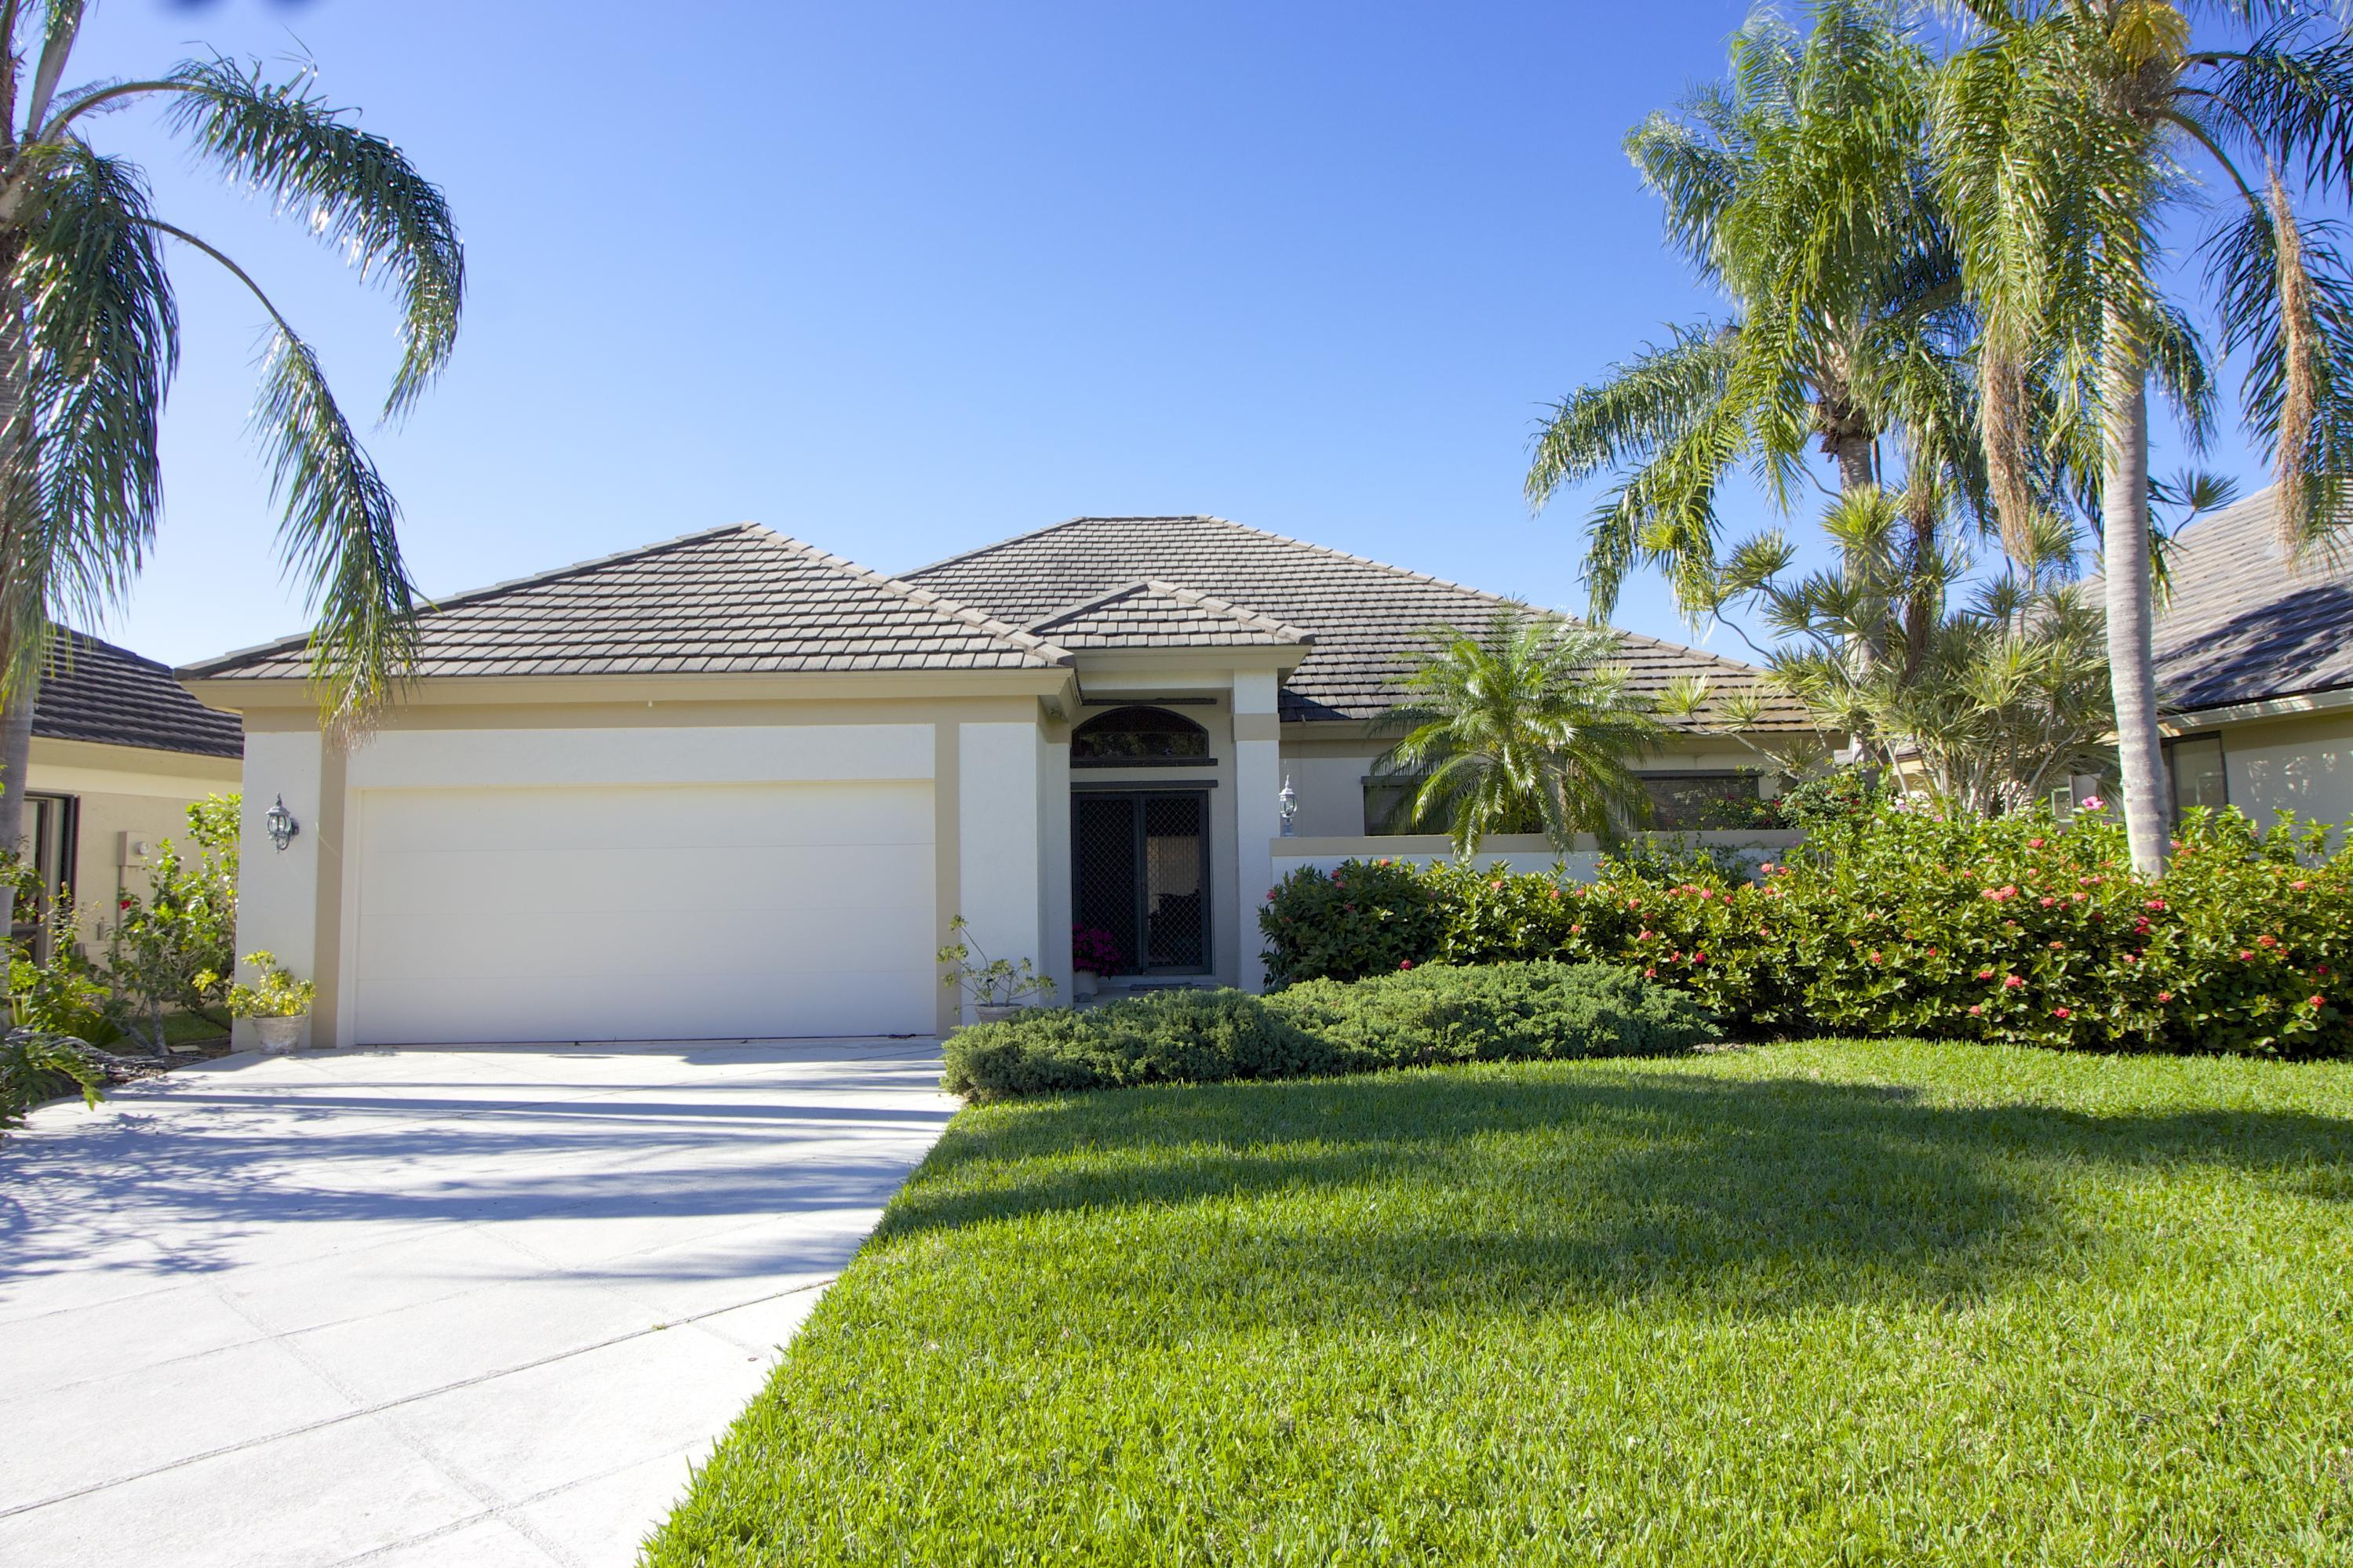 13057 Green Turtle Way, Tequesta, Florida 33469, 2 Bedrooms Bedrooms, ,2 BathroomsBathrooms,A,Single family,Green Turtle,RX-10510322